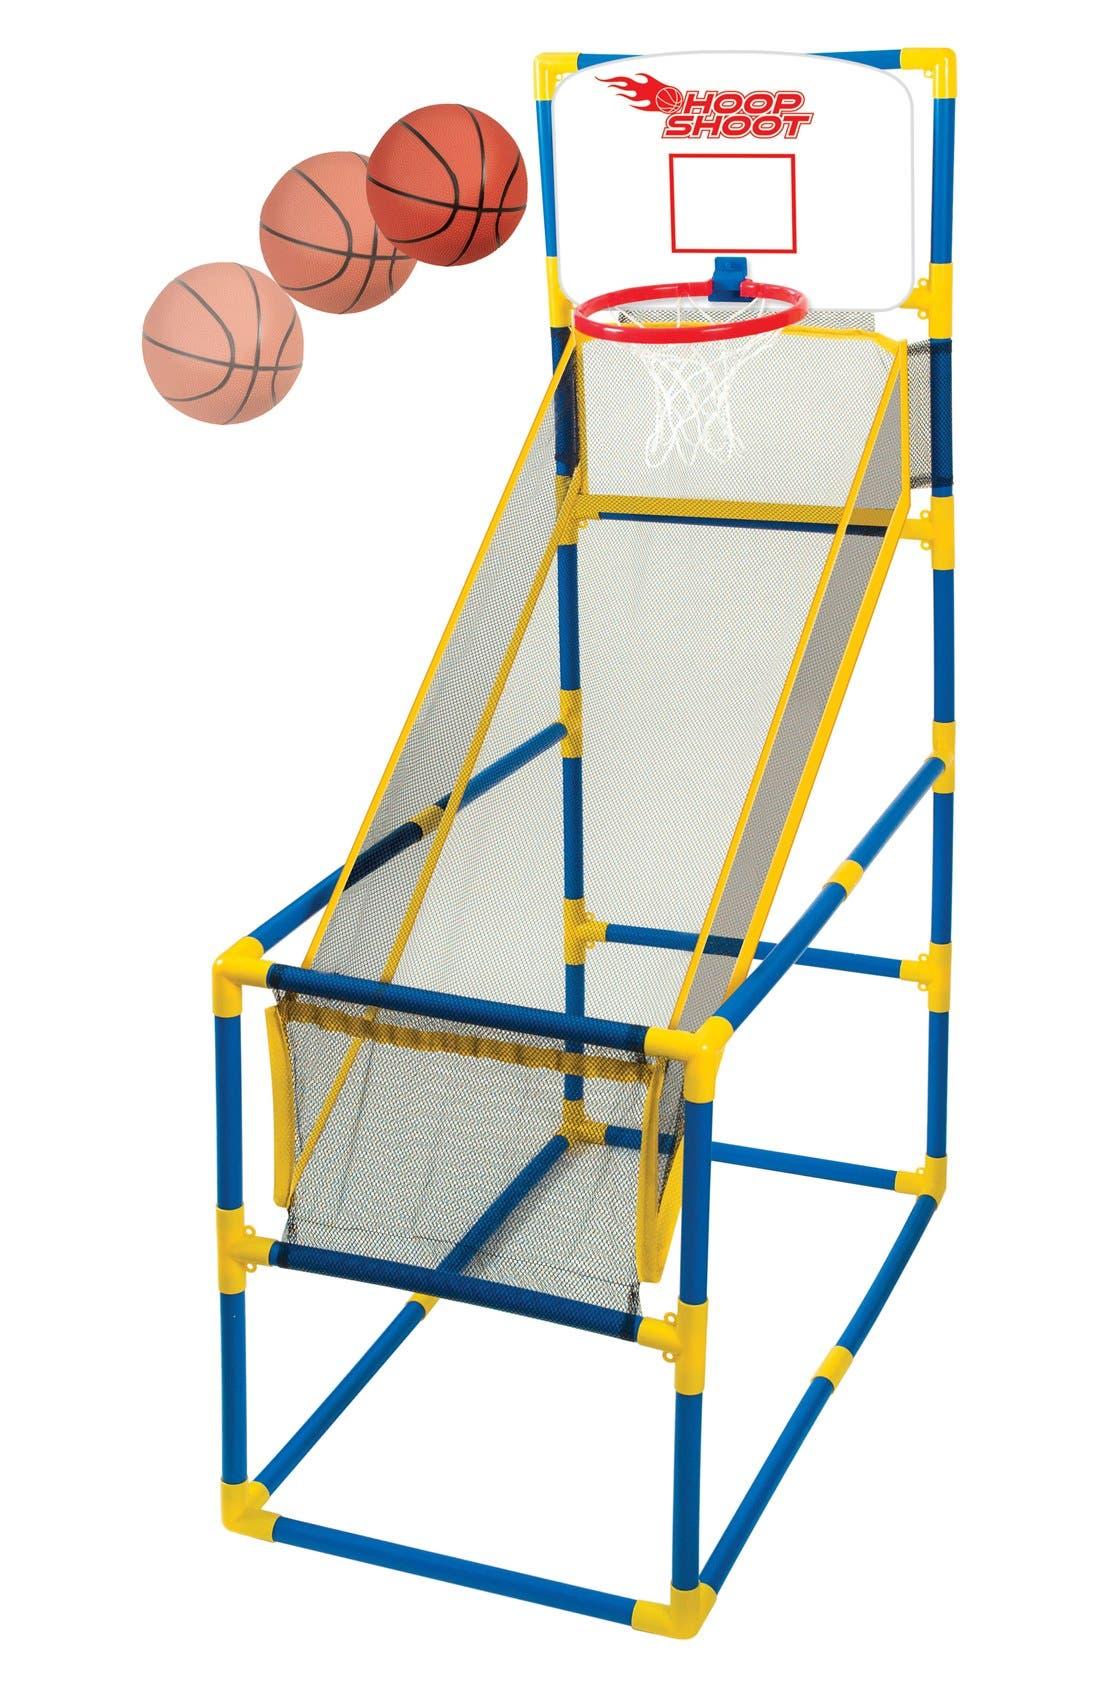 Alternate Image 1 Selected - Westminster Toys Hoop Shoot Basketball Play Set